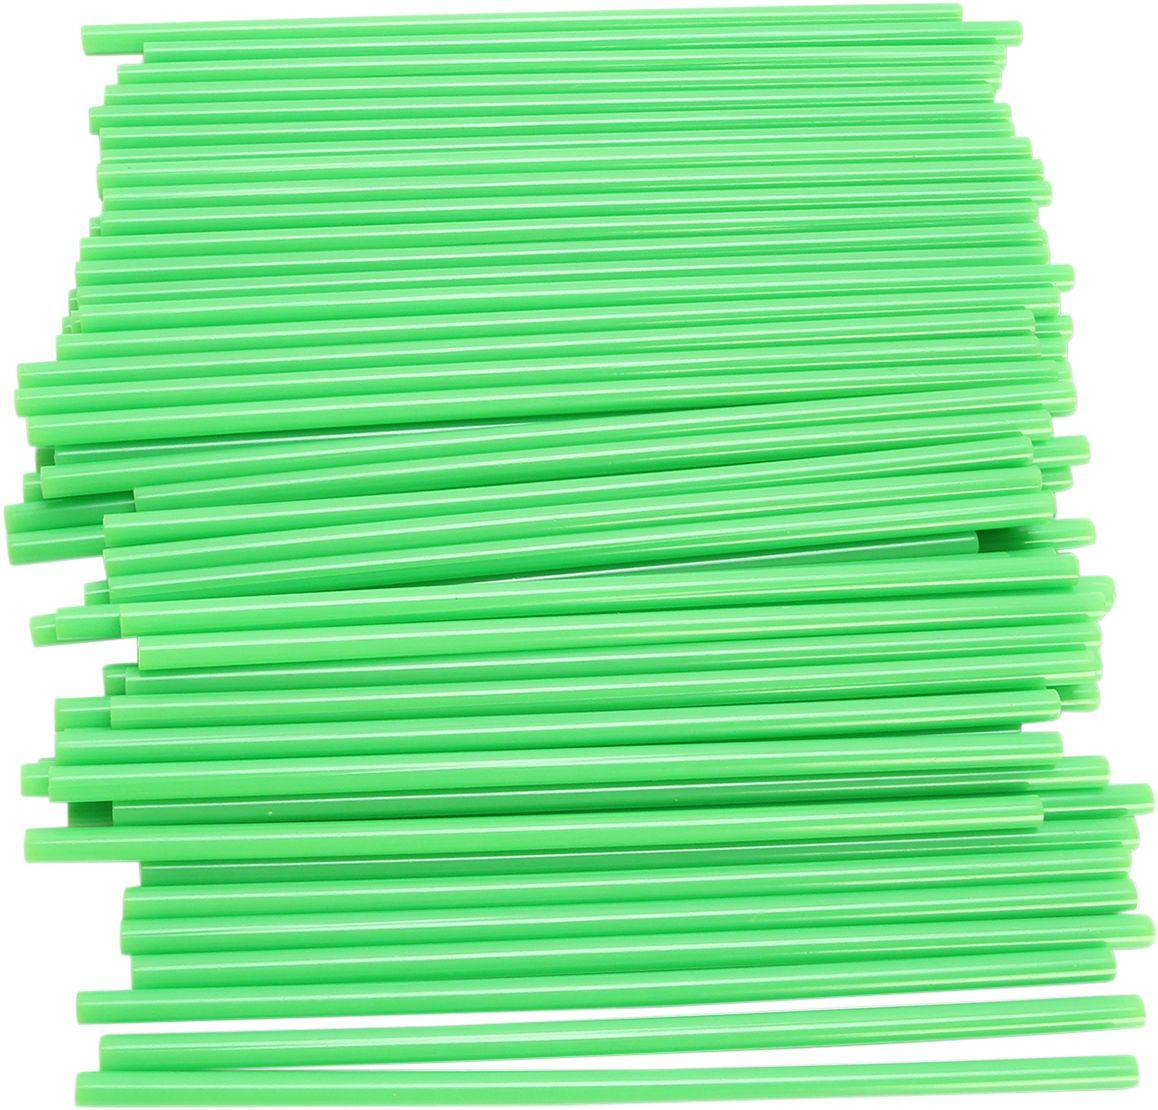 SPOKE COVERS GREEN 80PK